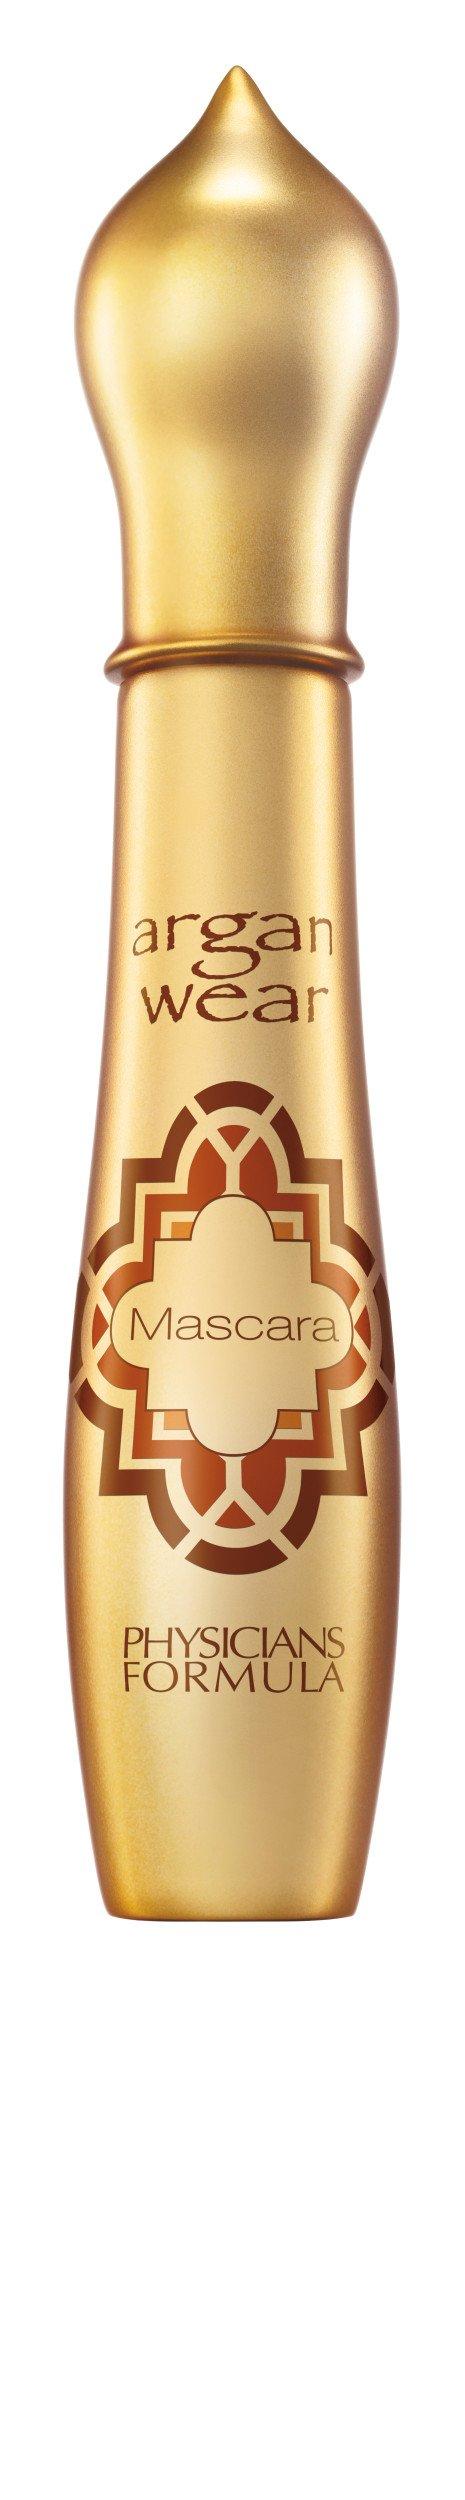 Physicians Formula Argan Wear Nourishing Argan Oil Mascara, Ultra Black